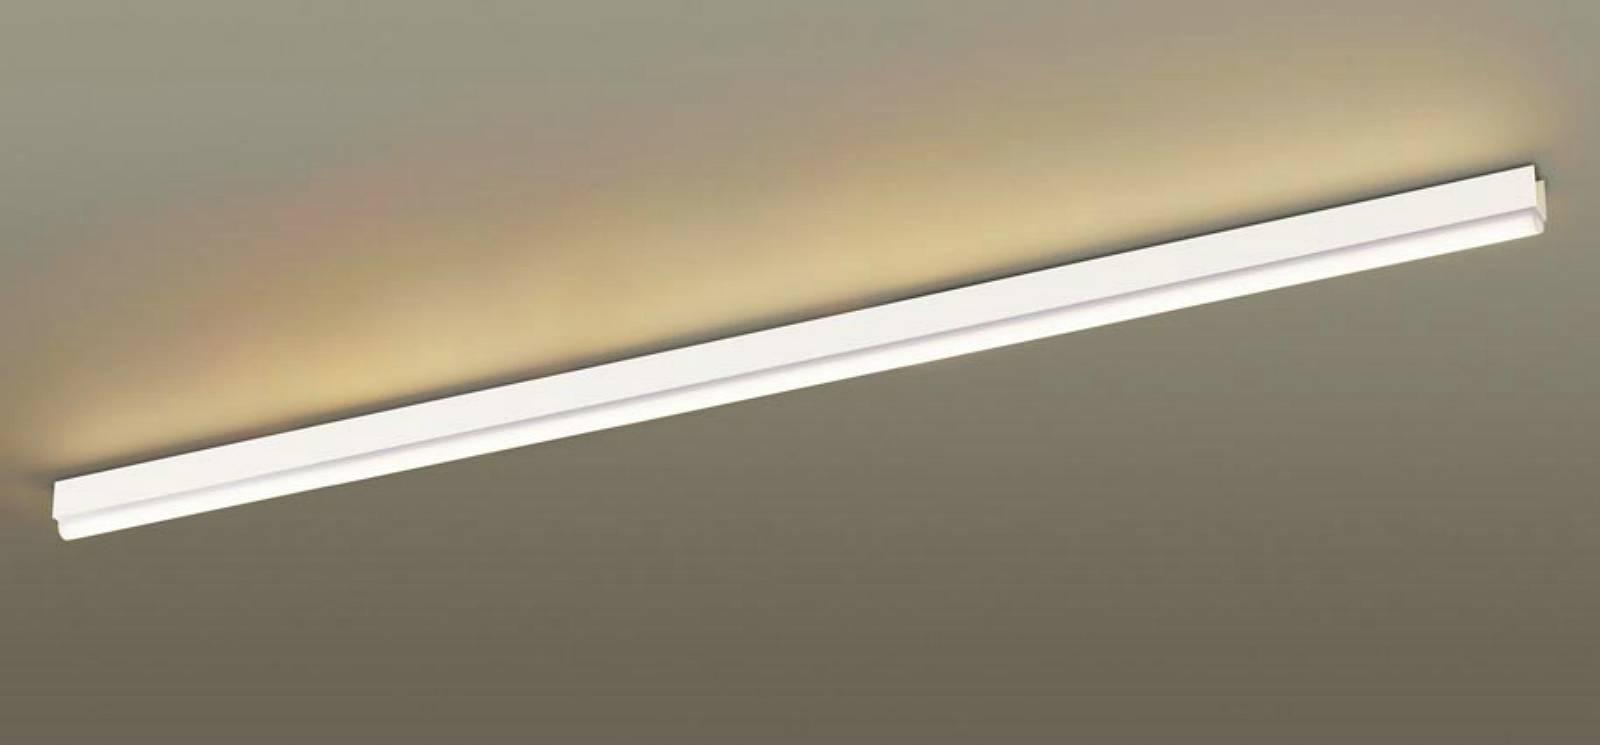 N区分 パナソニック LGB50614LB1 ベースライト 建築化照明器具 畳数設定無し LED【setsuden_led】